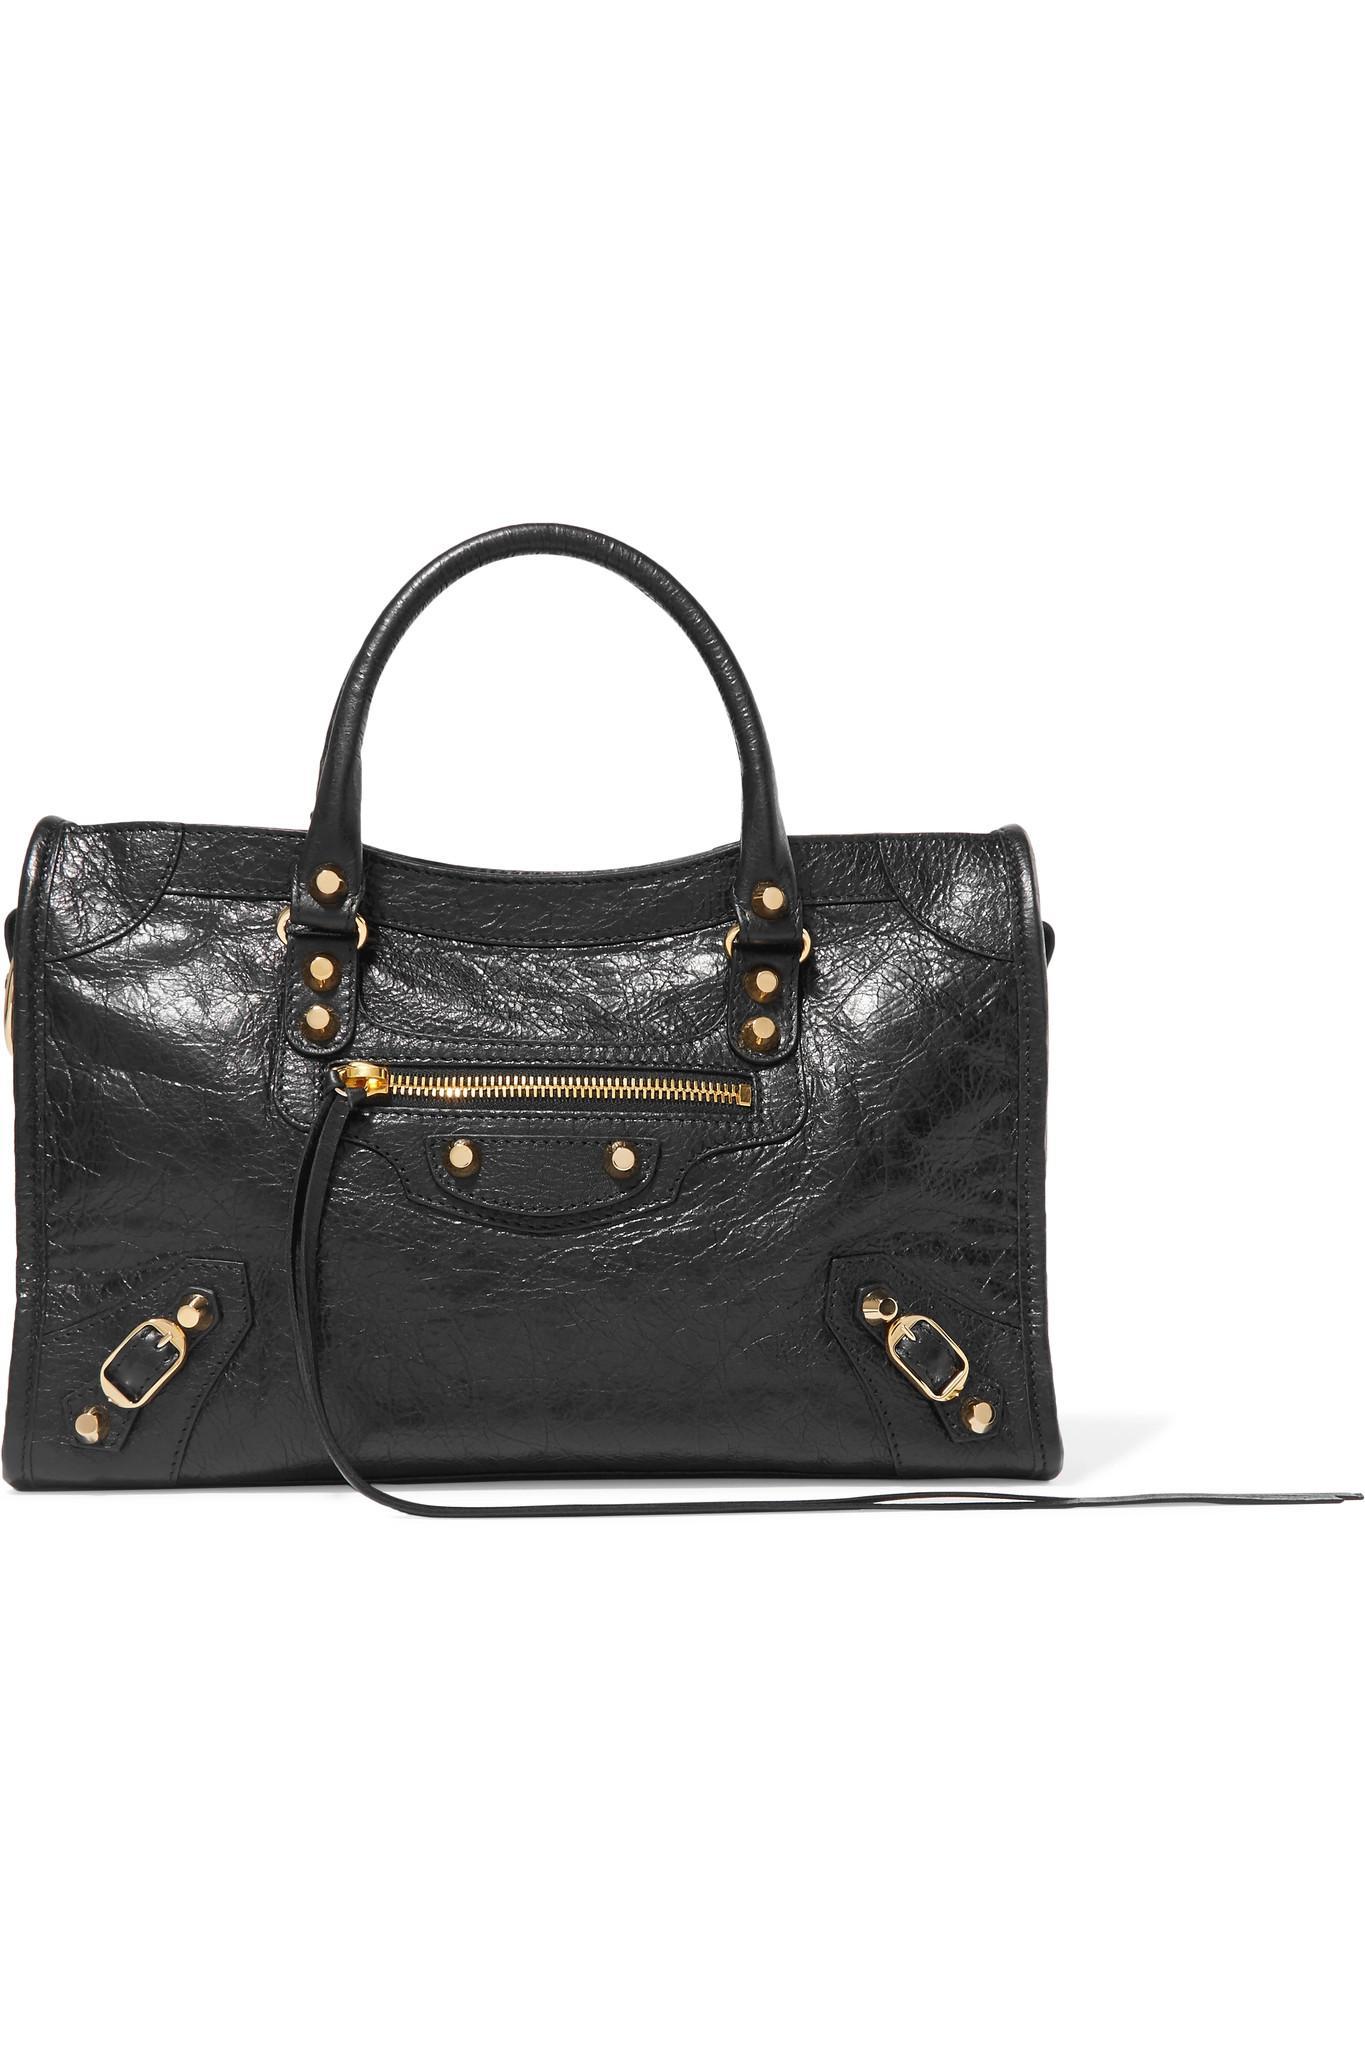 b1b7d6539fa3 Balenciaga Classic City Textured-leather Tote in Black - Lyst